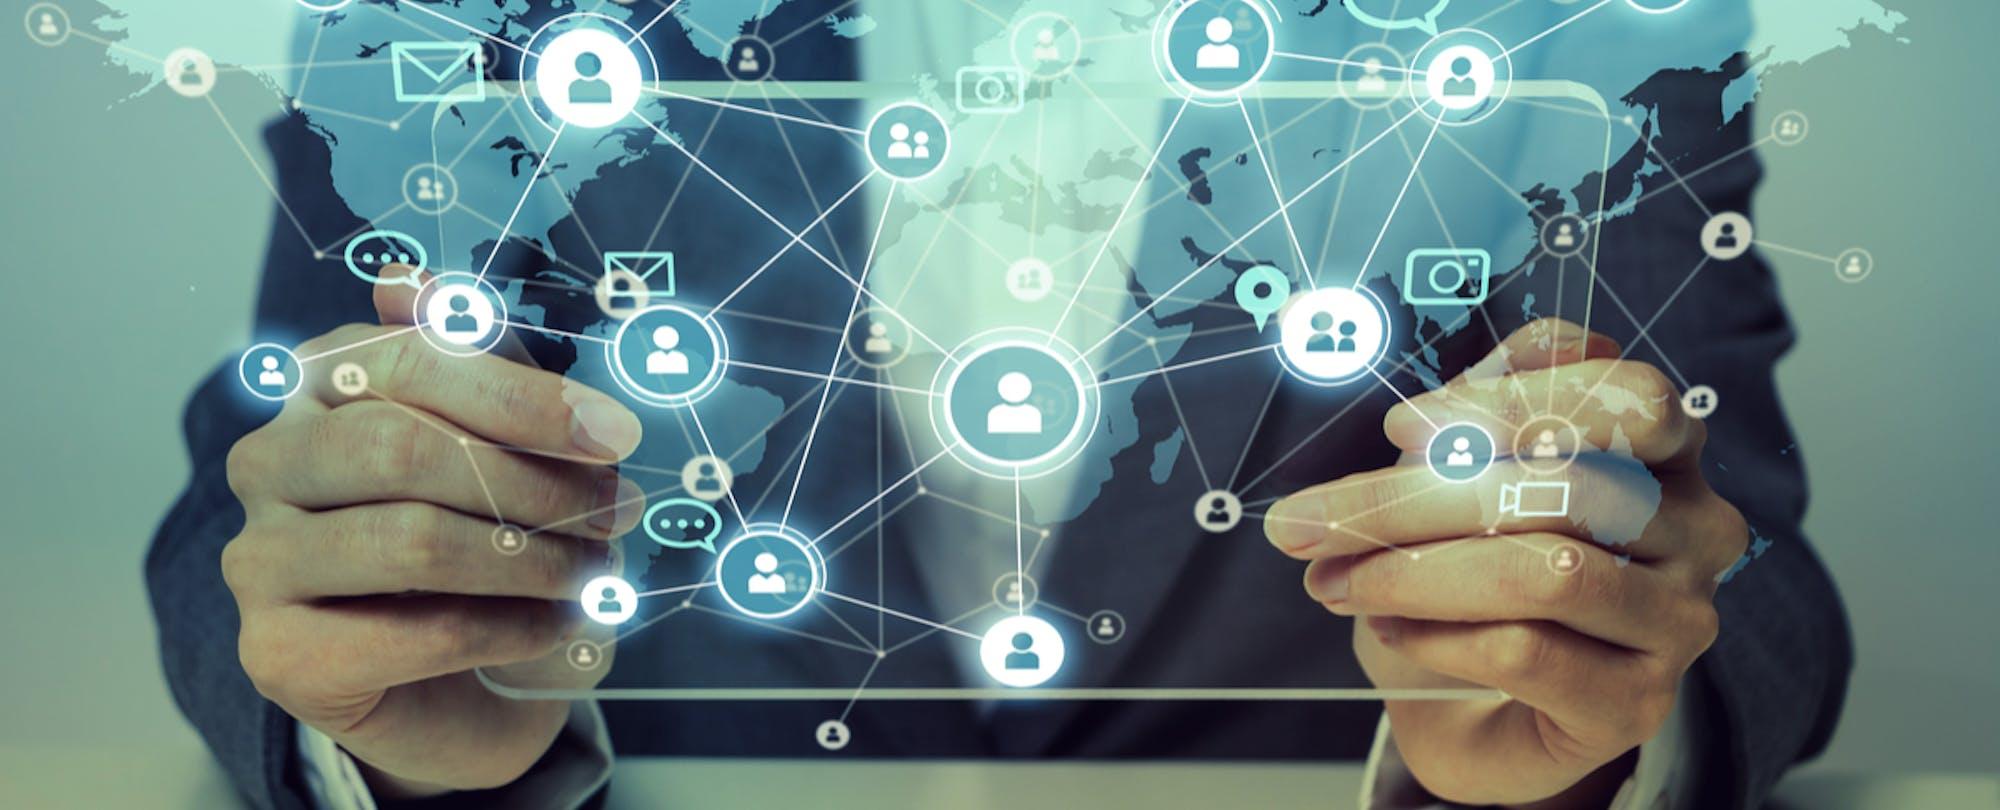 Optimizing Your LinkedIn Profile for Your Edtech Job Hunt